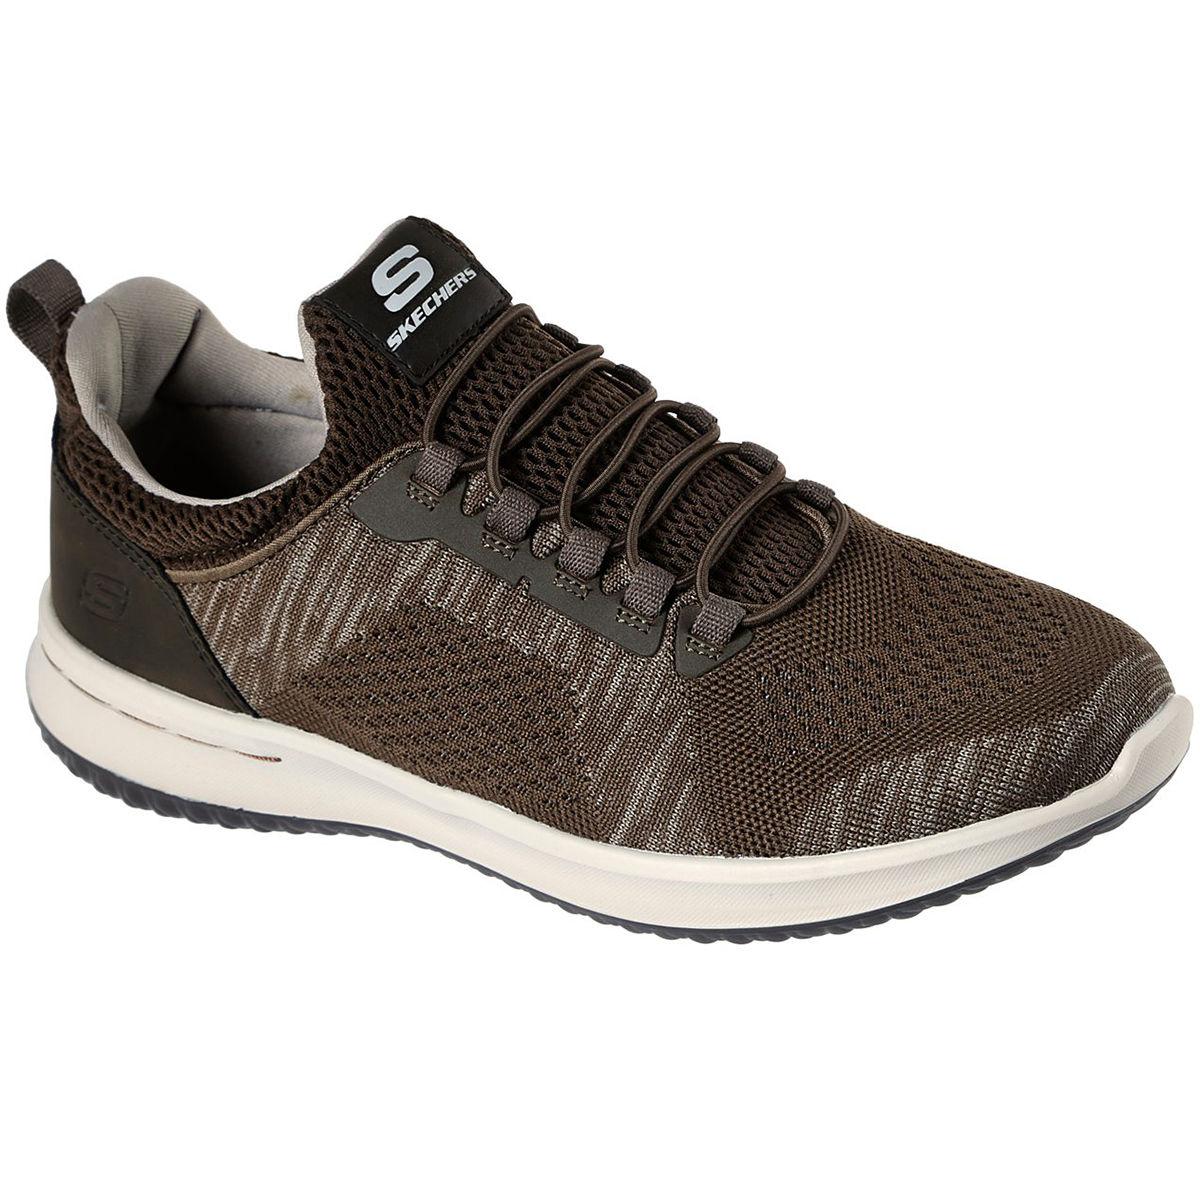 Skechers Men's Delson  -  Brewton Sneakers - Brown, 9